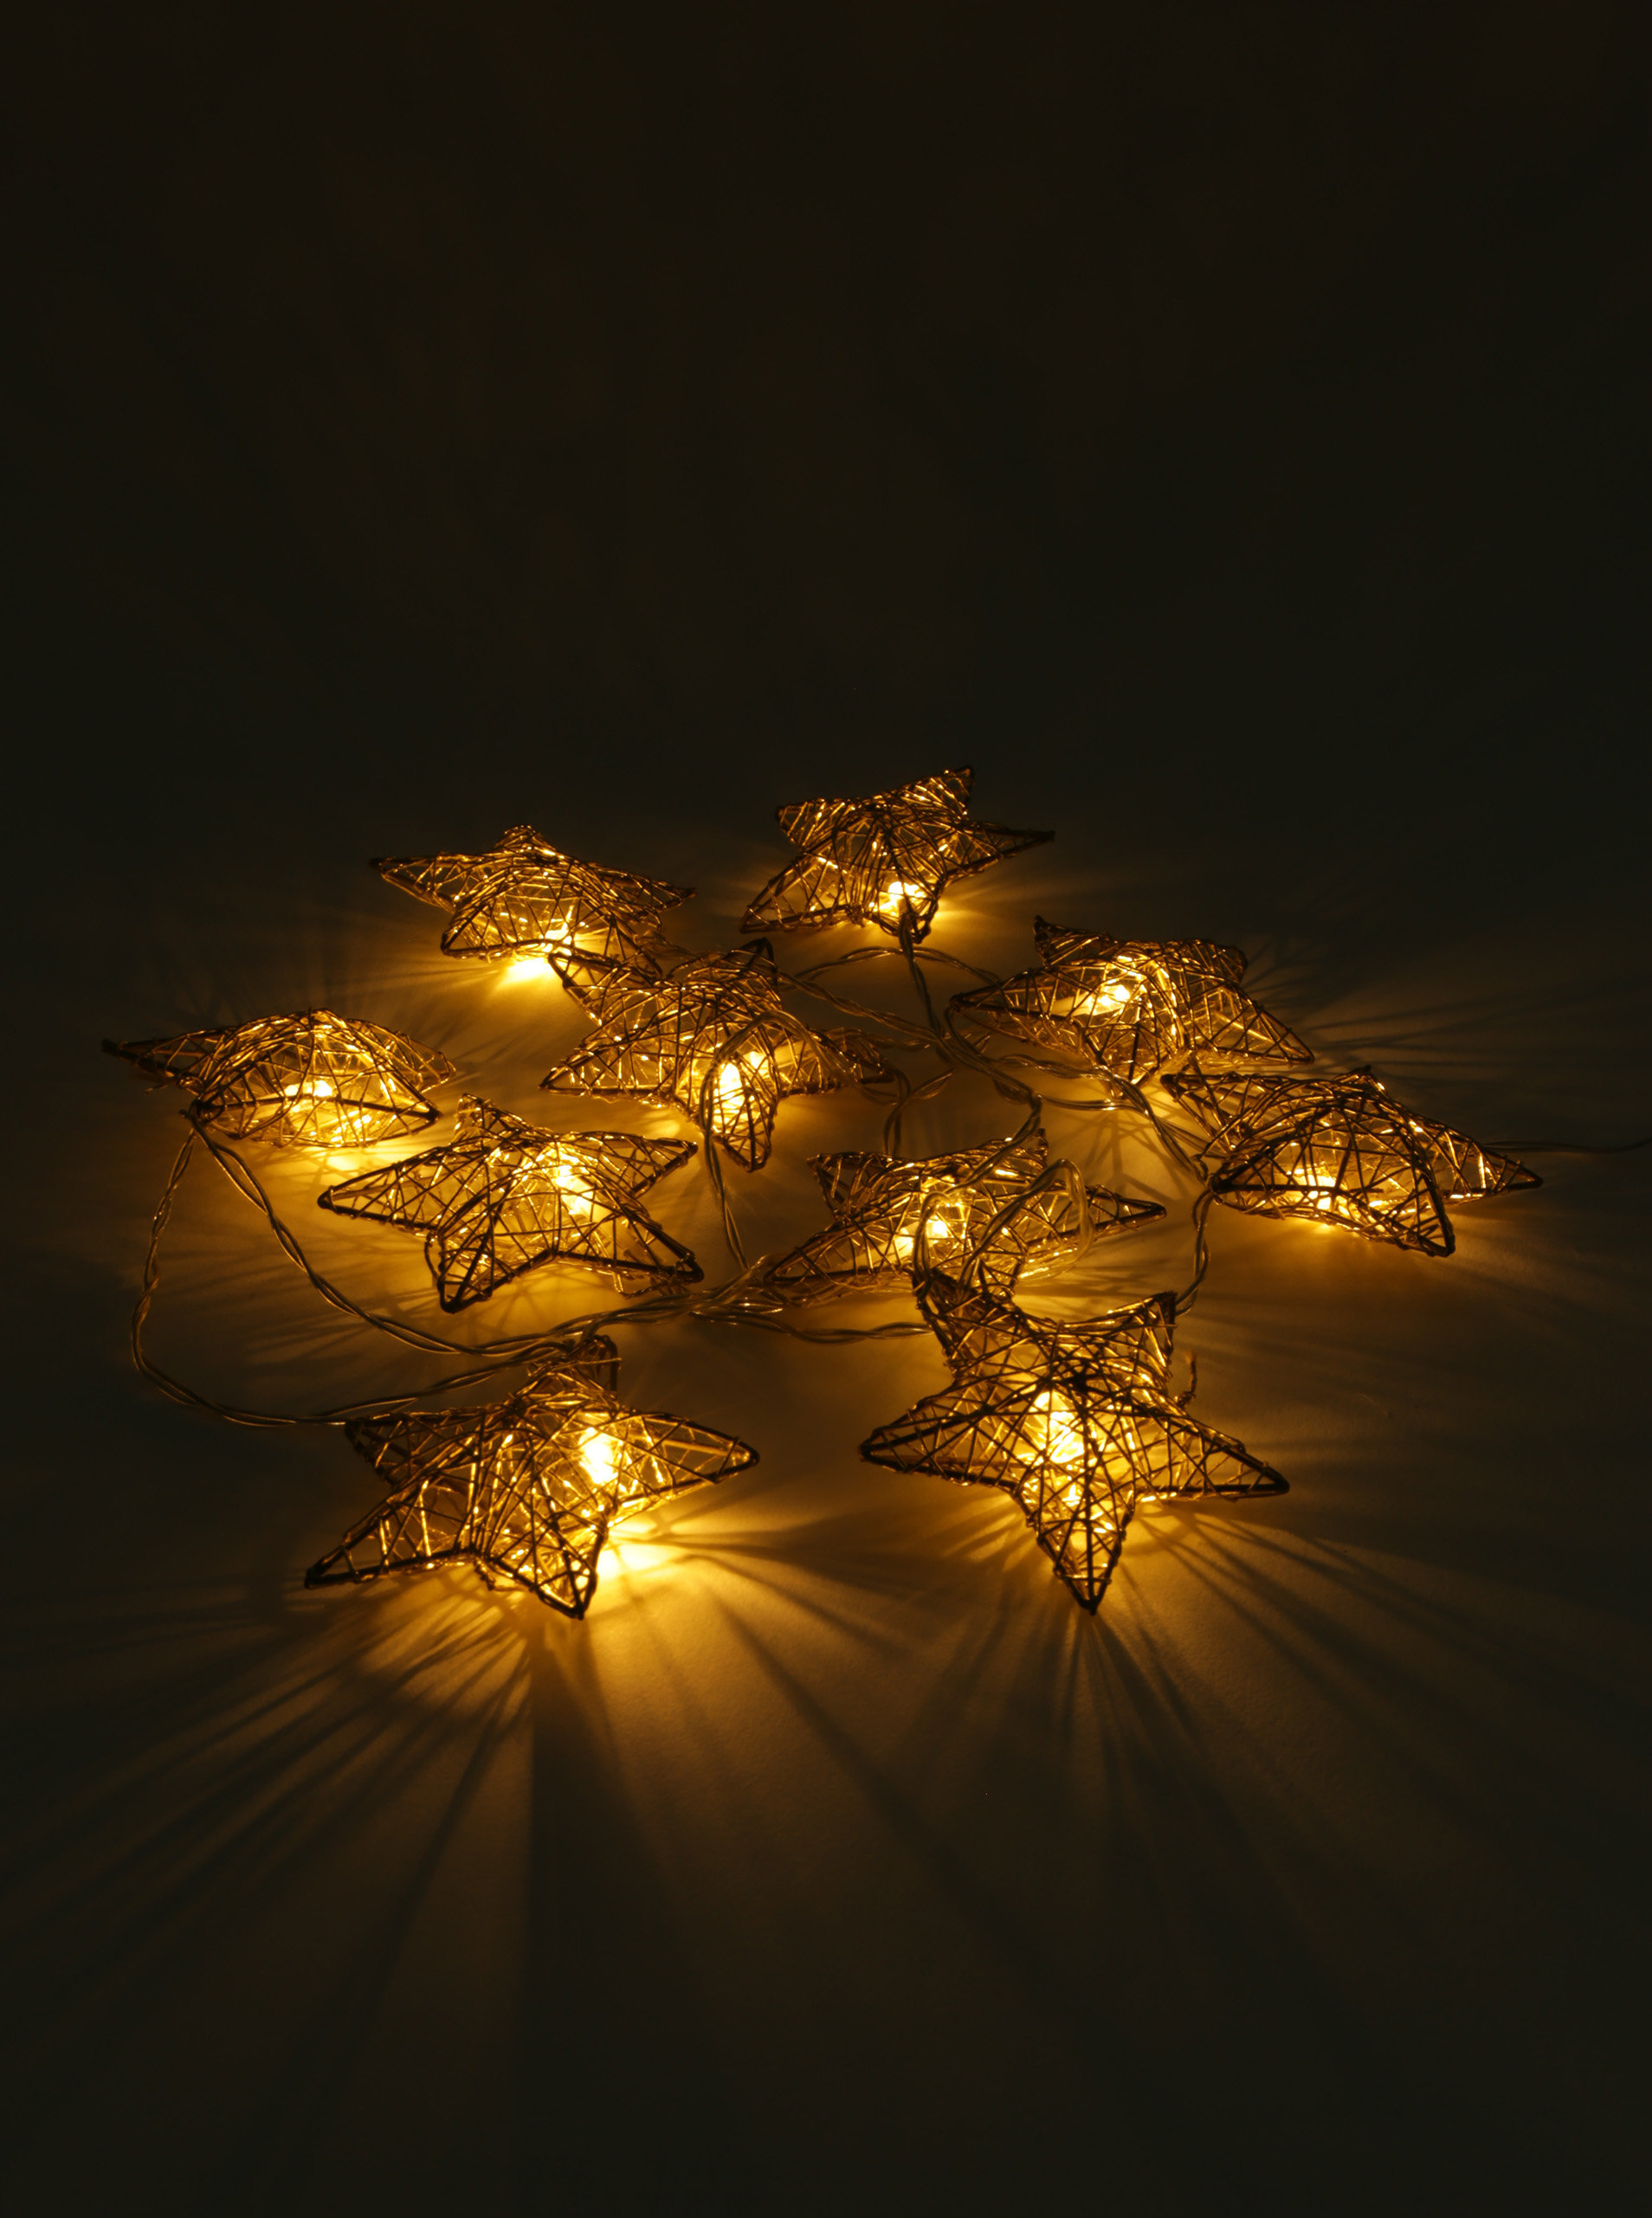 c07a9c045 LED svetelná reťaž v tvare hviezd v zlatej farbe Kaemingk | ZOOT.sk